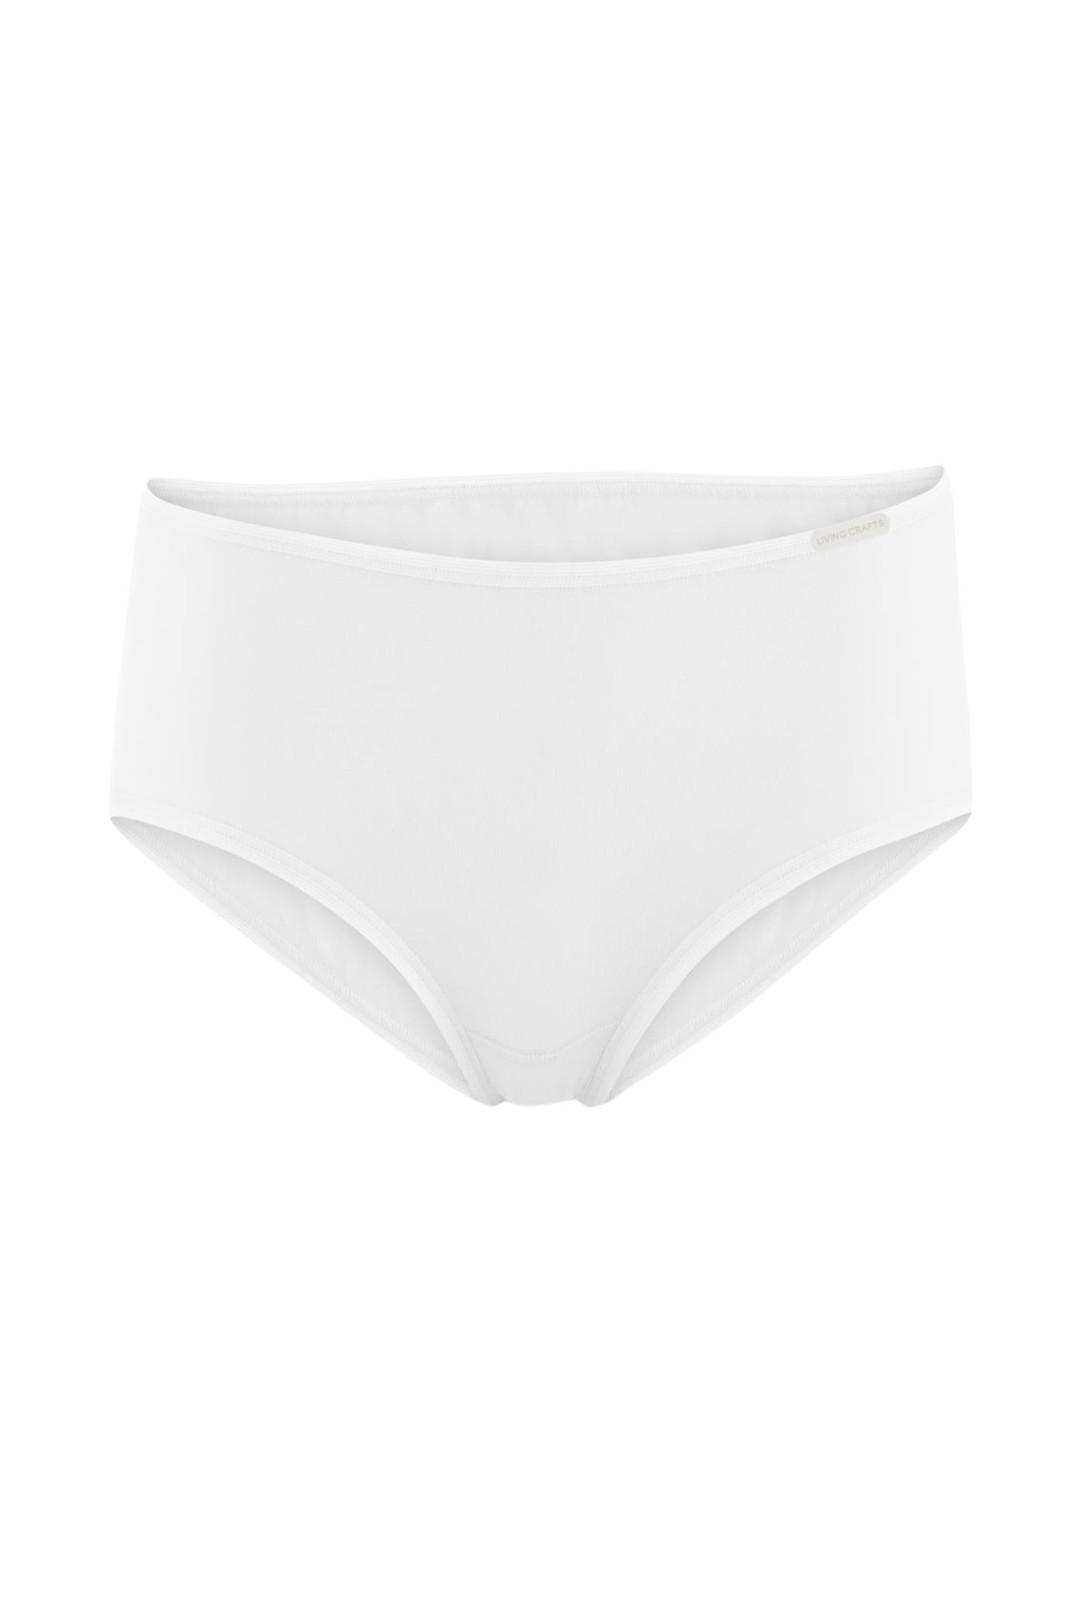 Francouzské kalhotky z bio bavlny